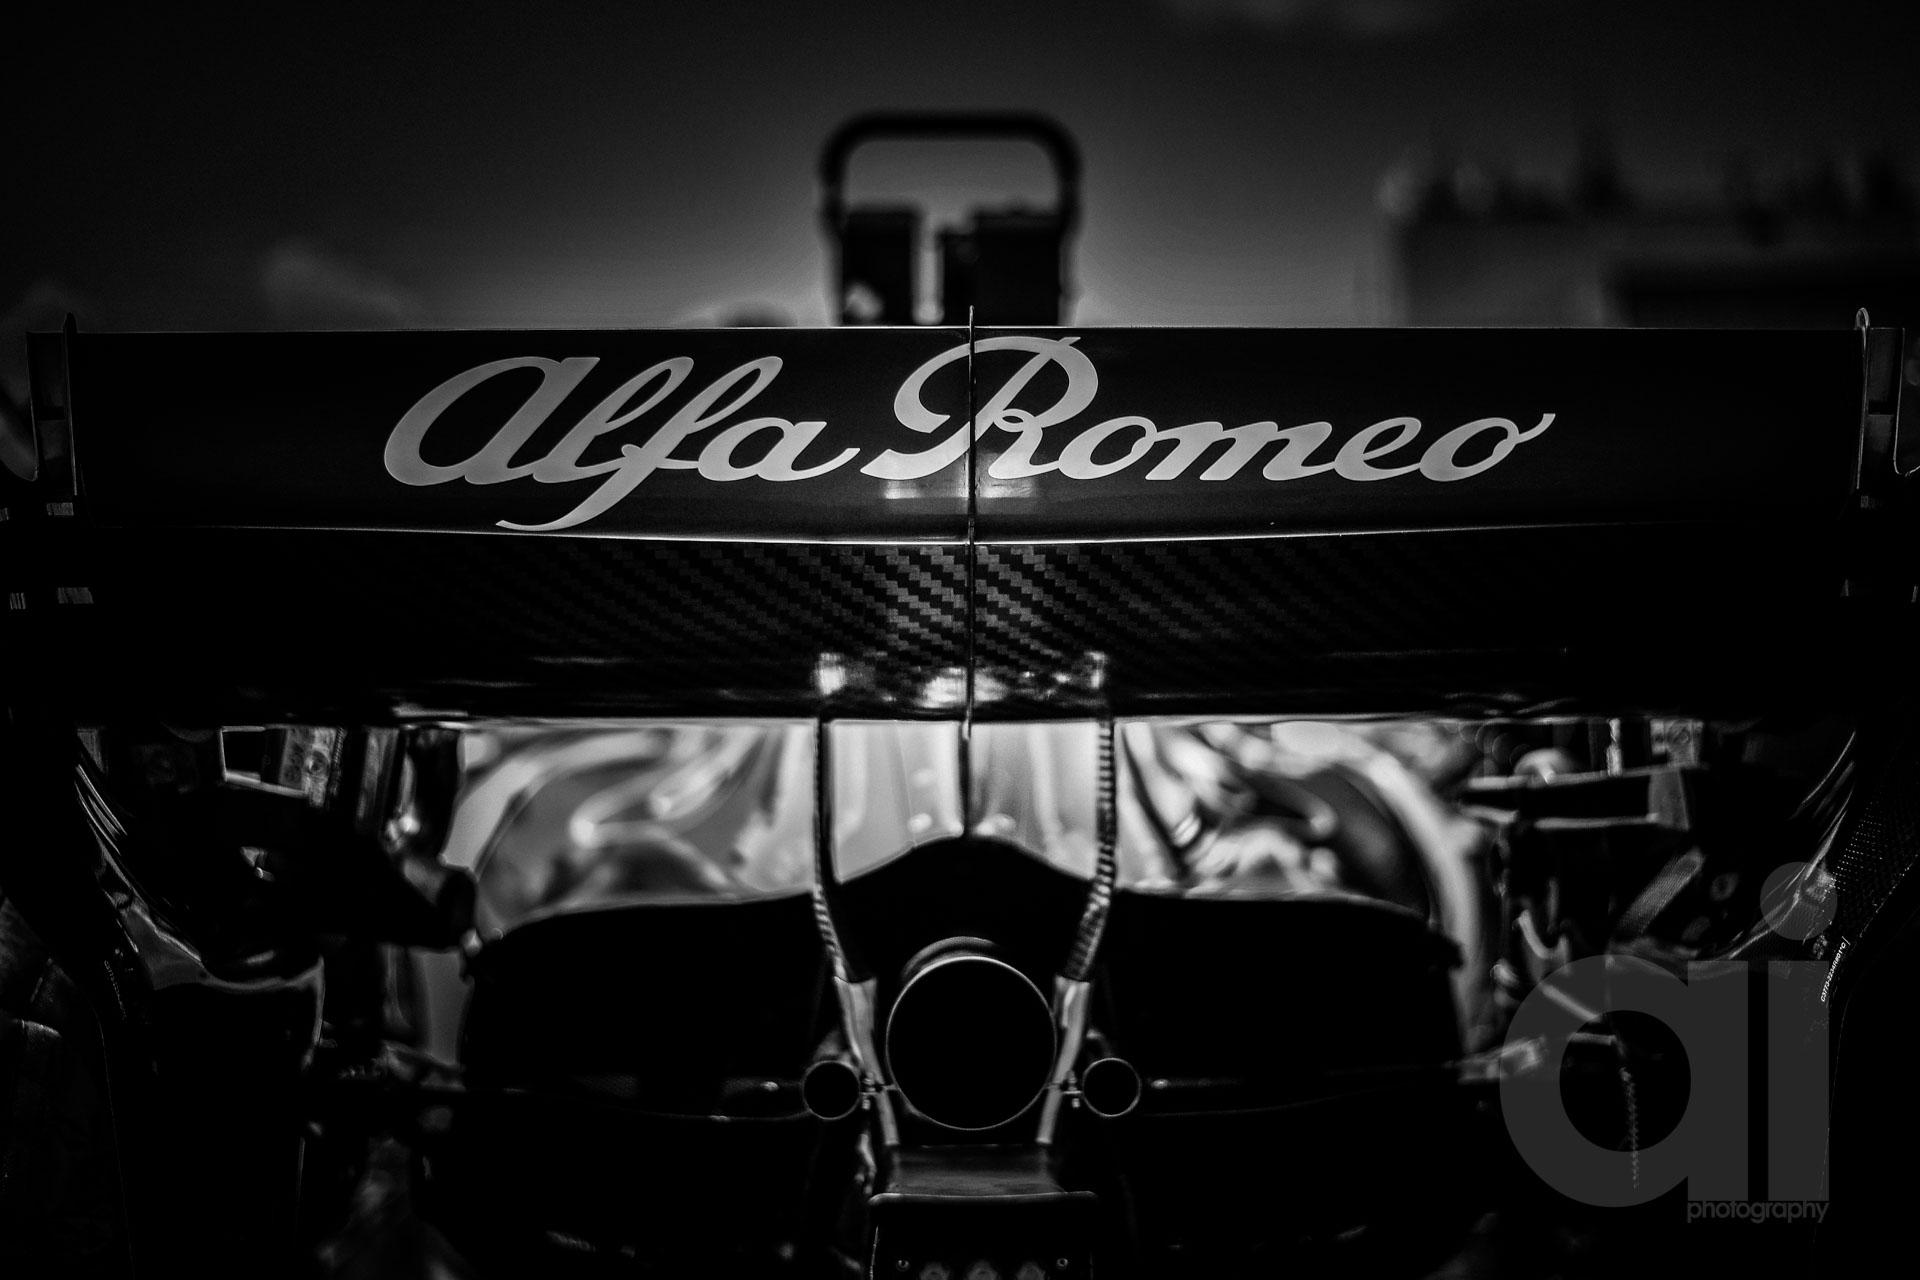 Formula 1 season 2018 in monochrome